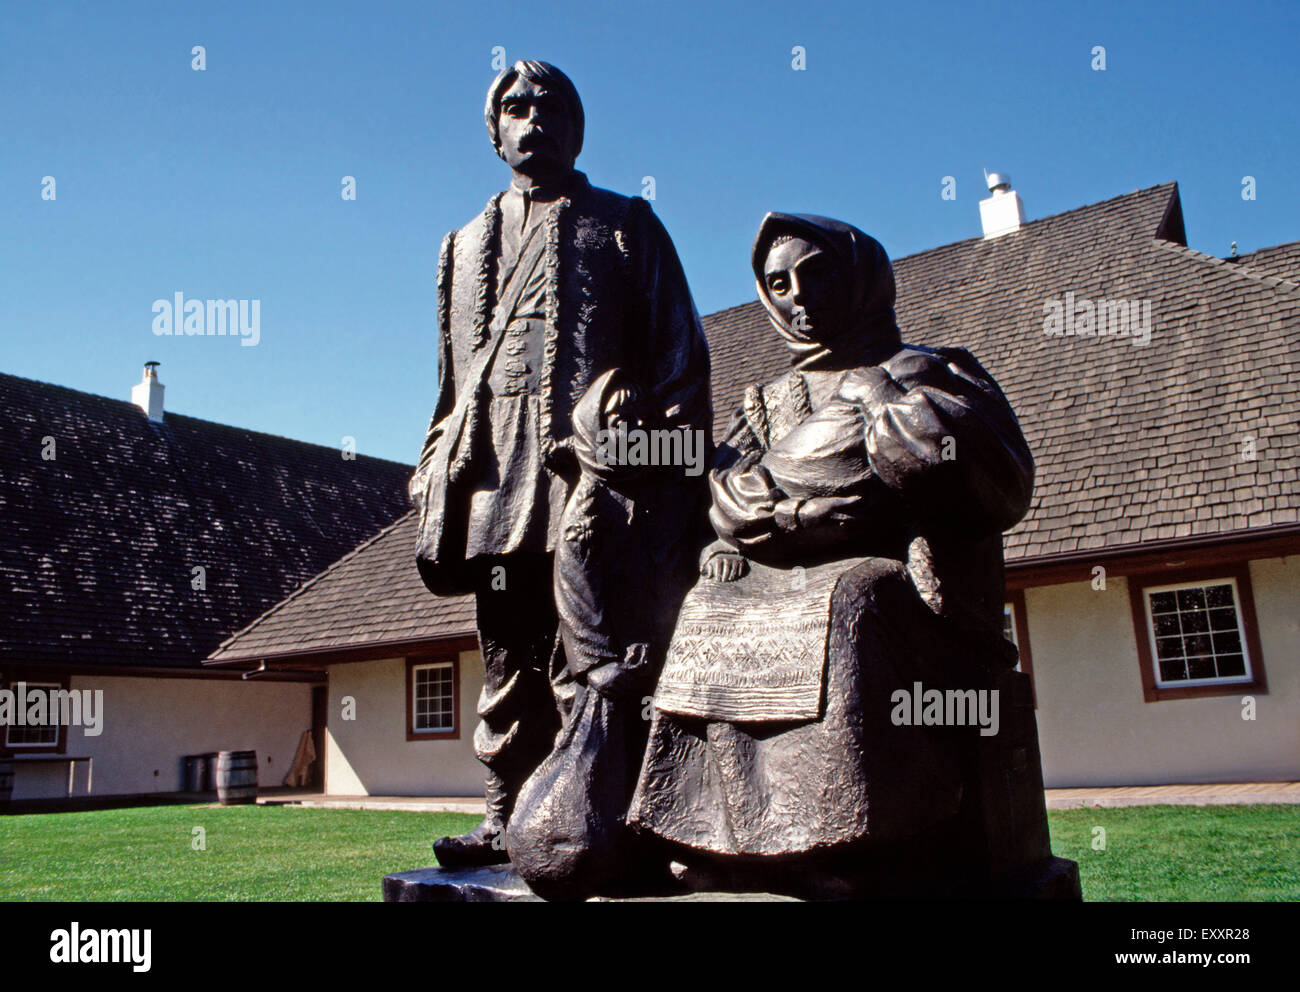 Historical bronze statue,Ukrainian Cultural Heritage Center,Edmonton,Alberta - Stock Image